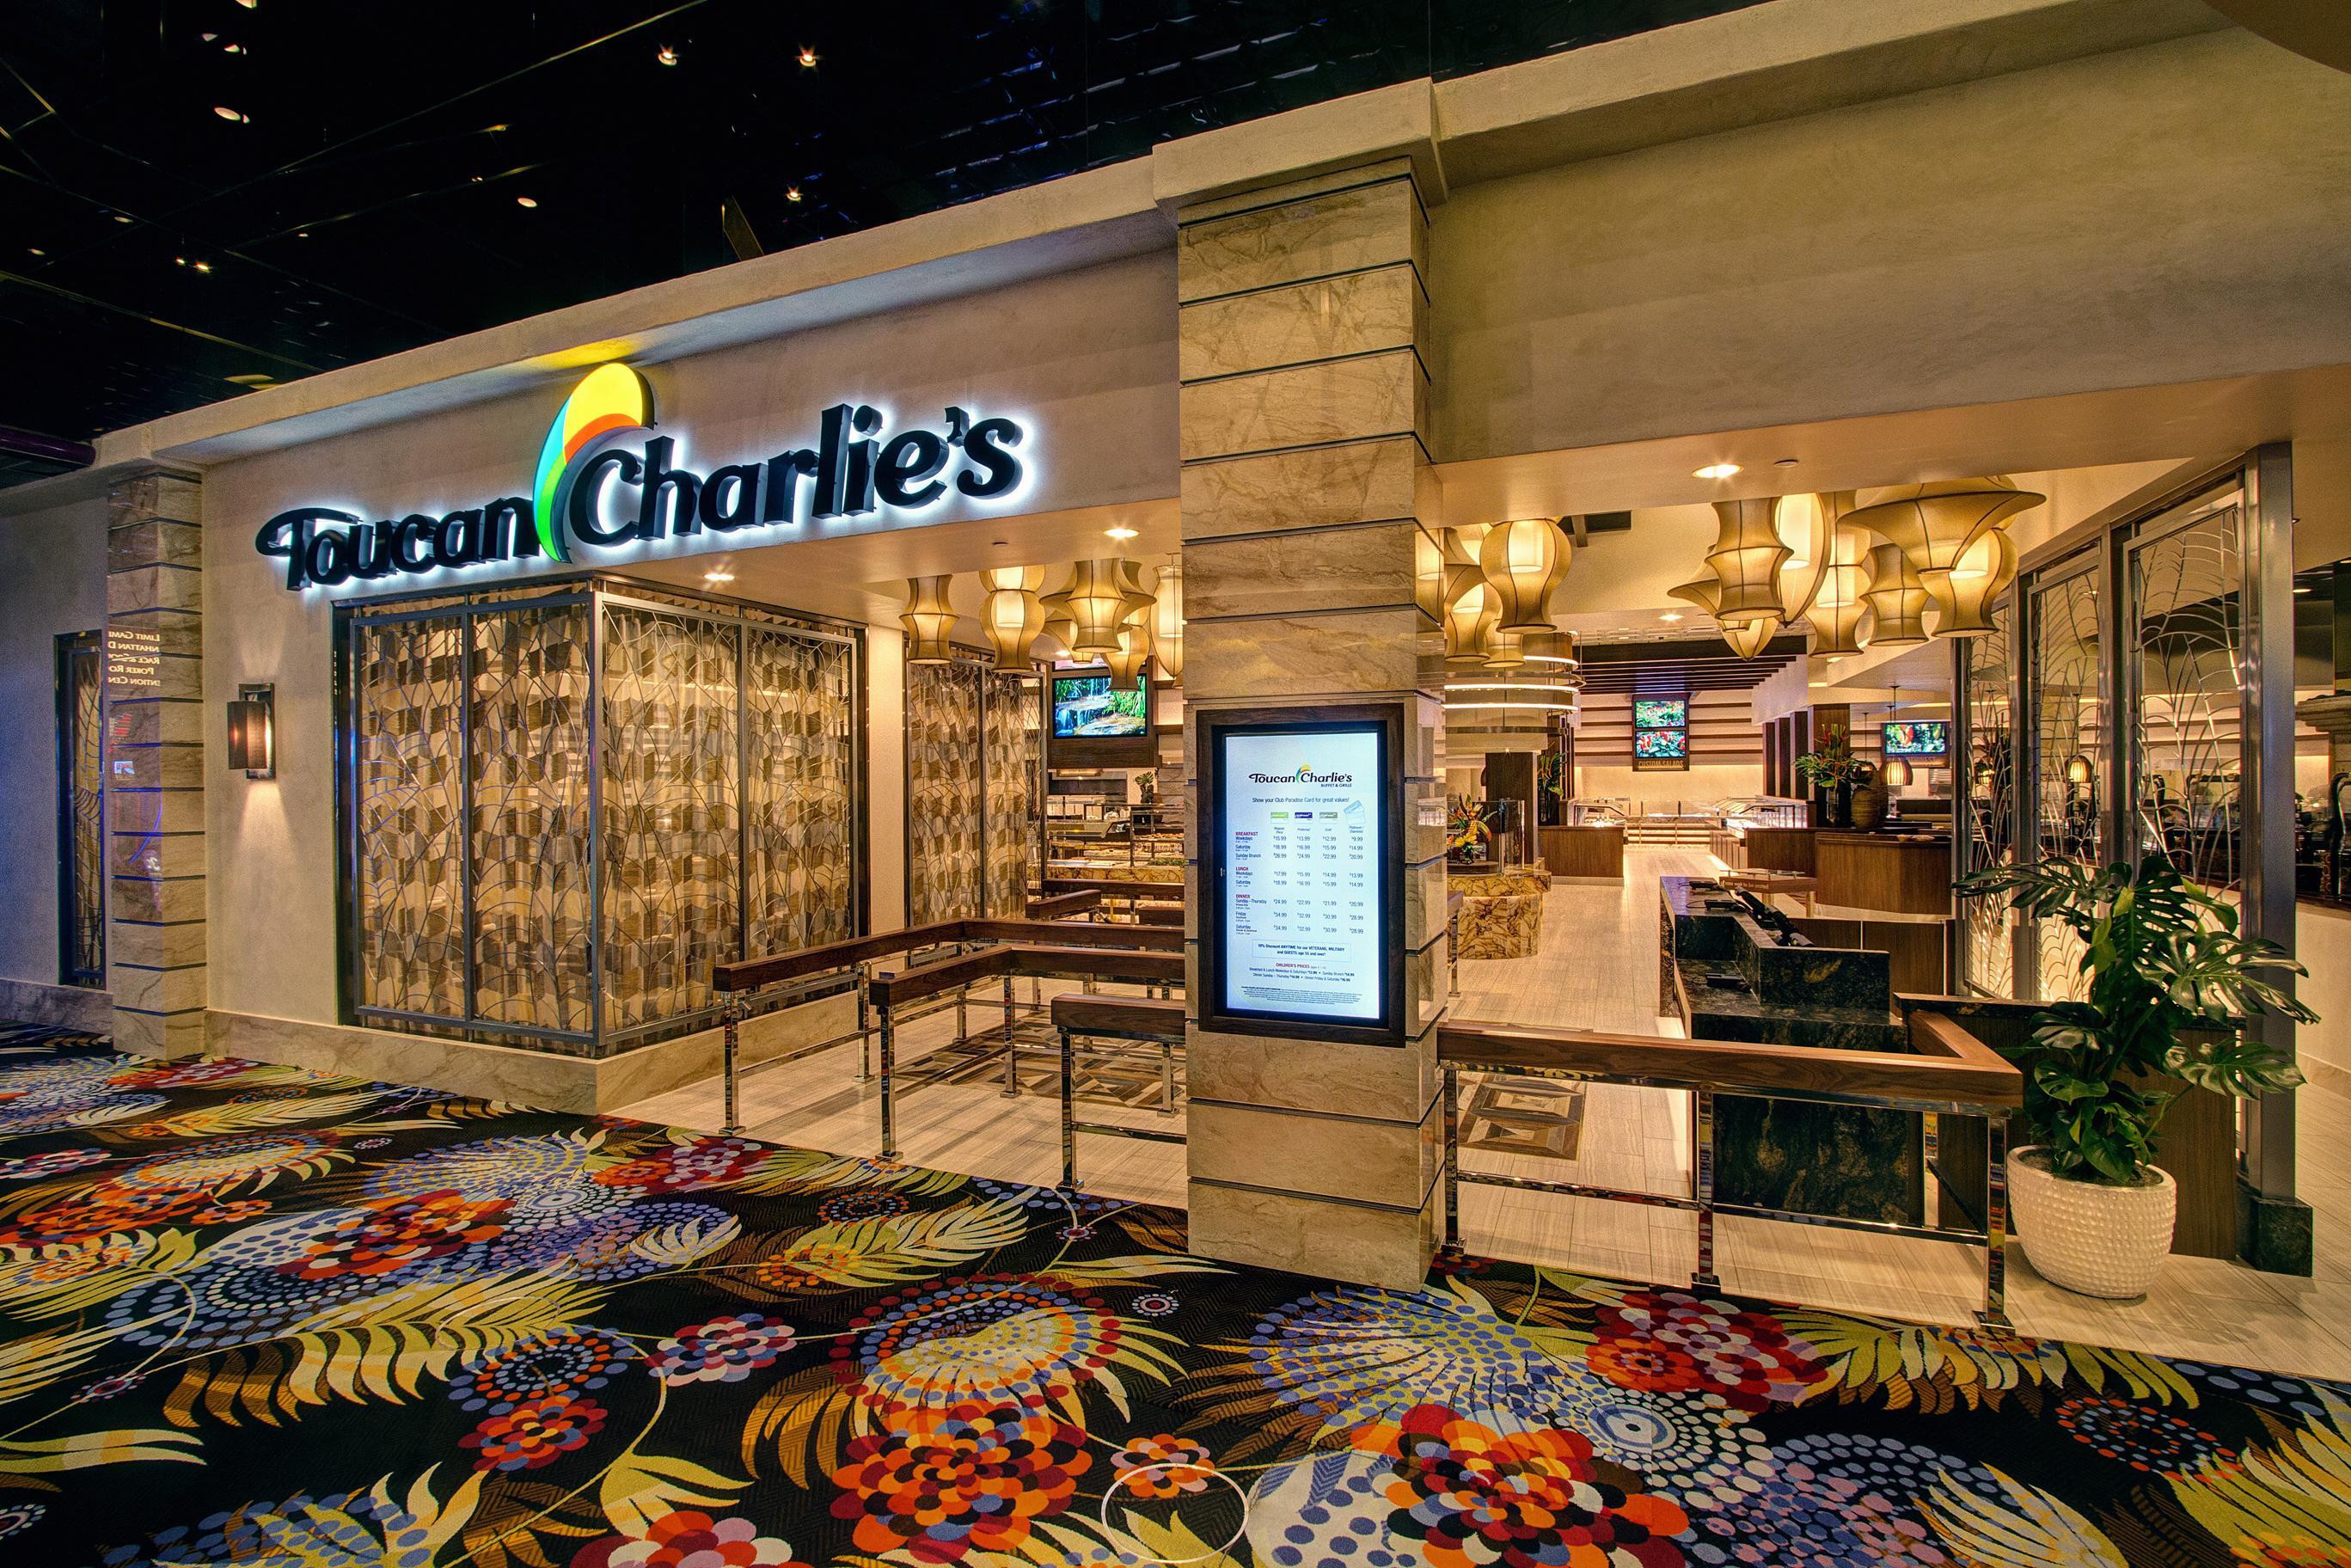 Atlantis casino resort darlyne sullivan contact grand ronde casino shuttle